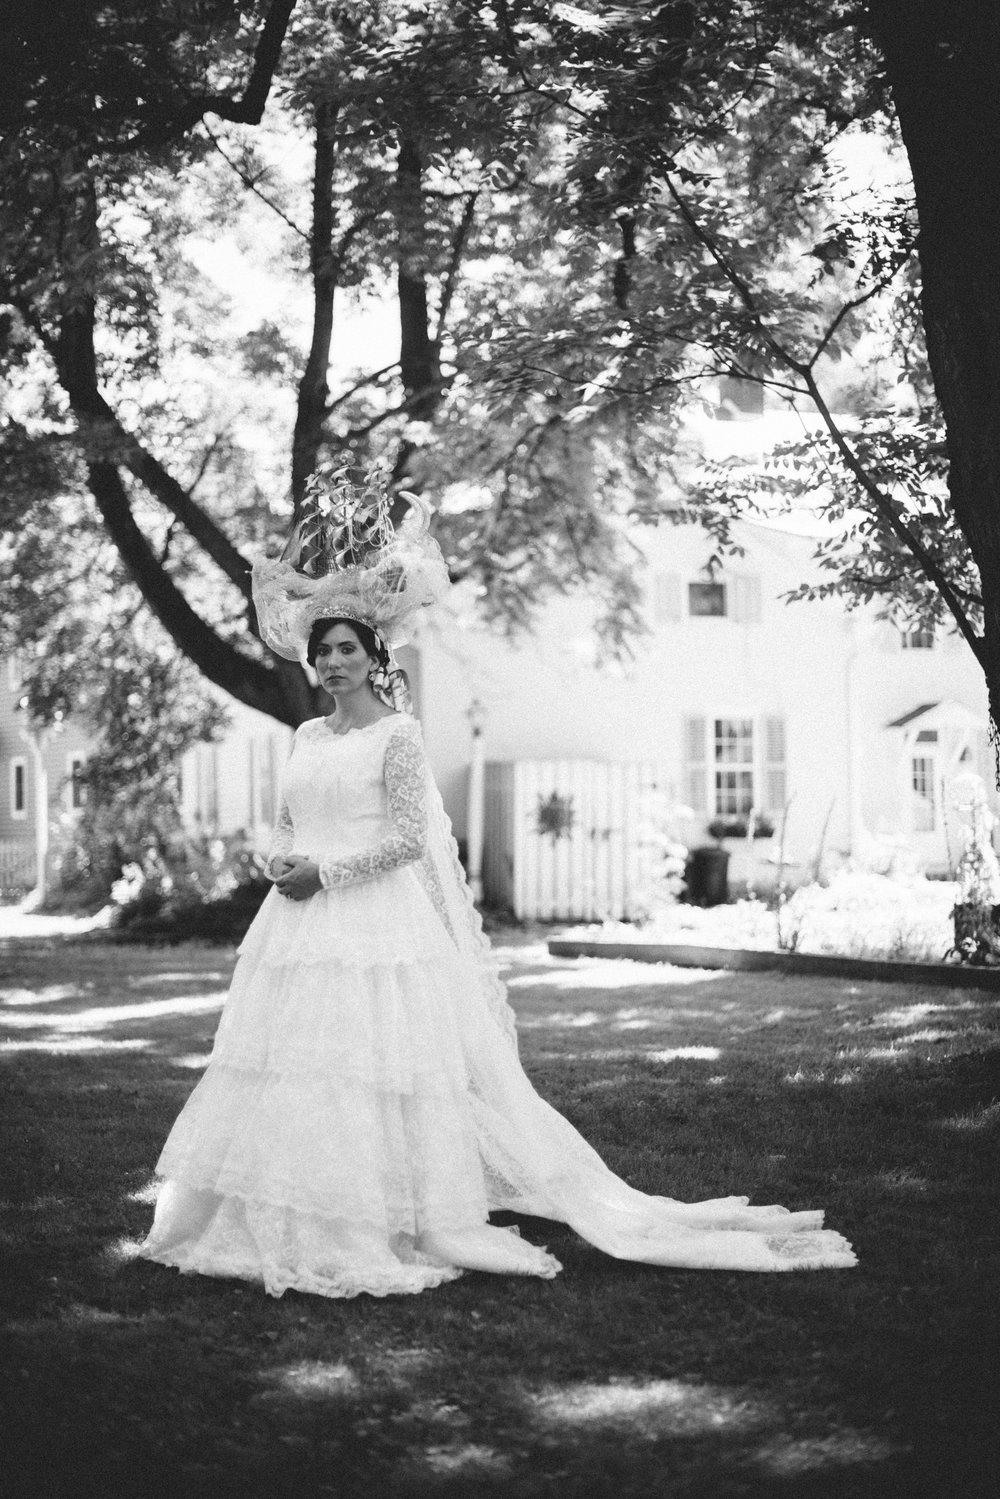 THPHOTO bride portrait vintage gown wedding dress sailbot headpiece beauty crown ferns Fawn Monique Make-Up Marina Christine Silvery Moon Guest House bw